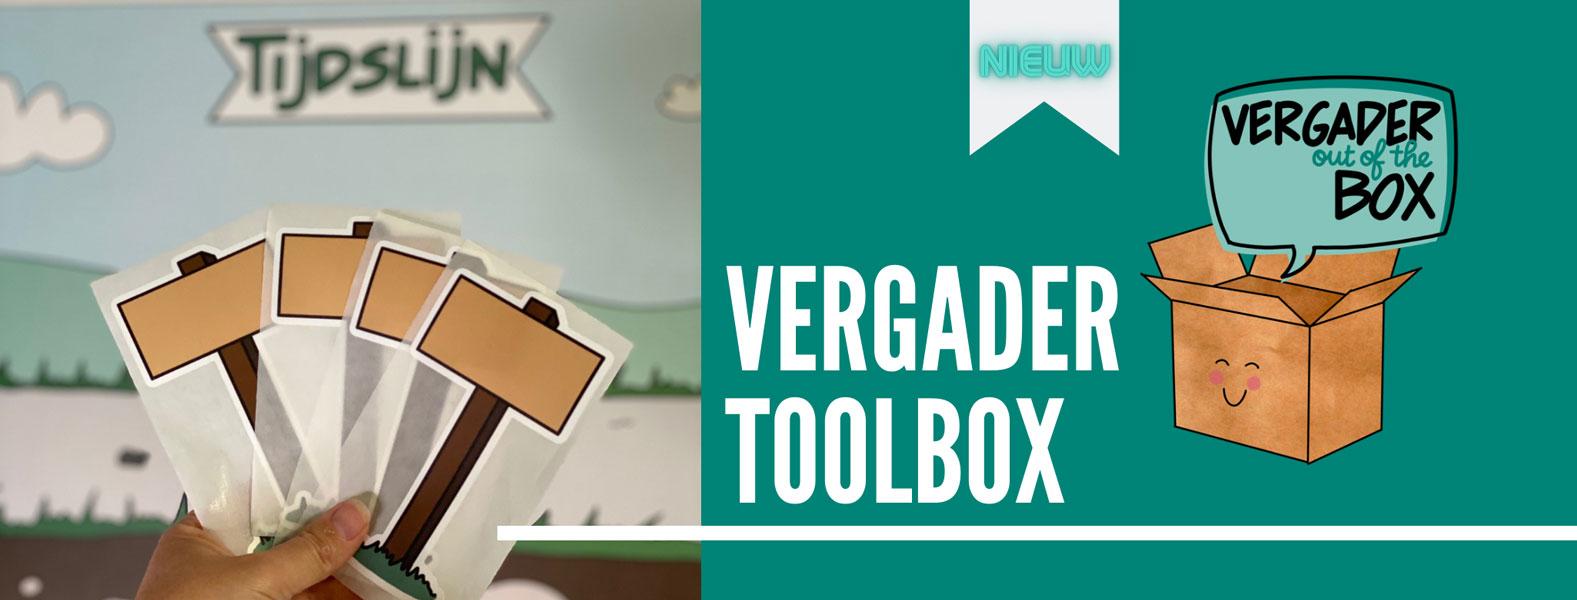 vergader toolbox